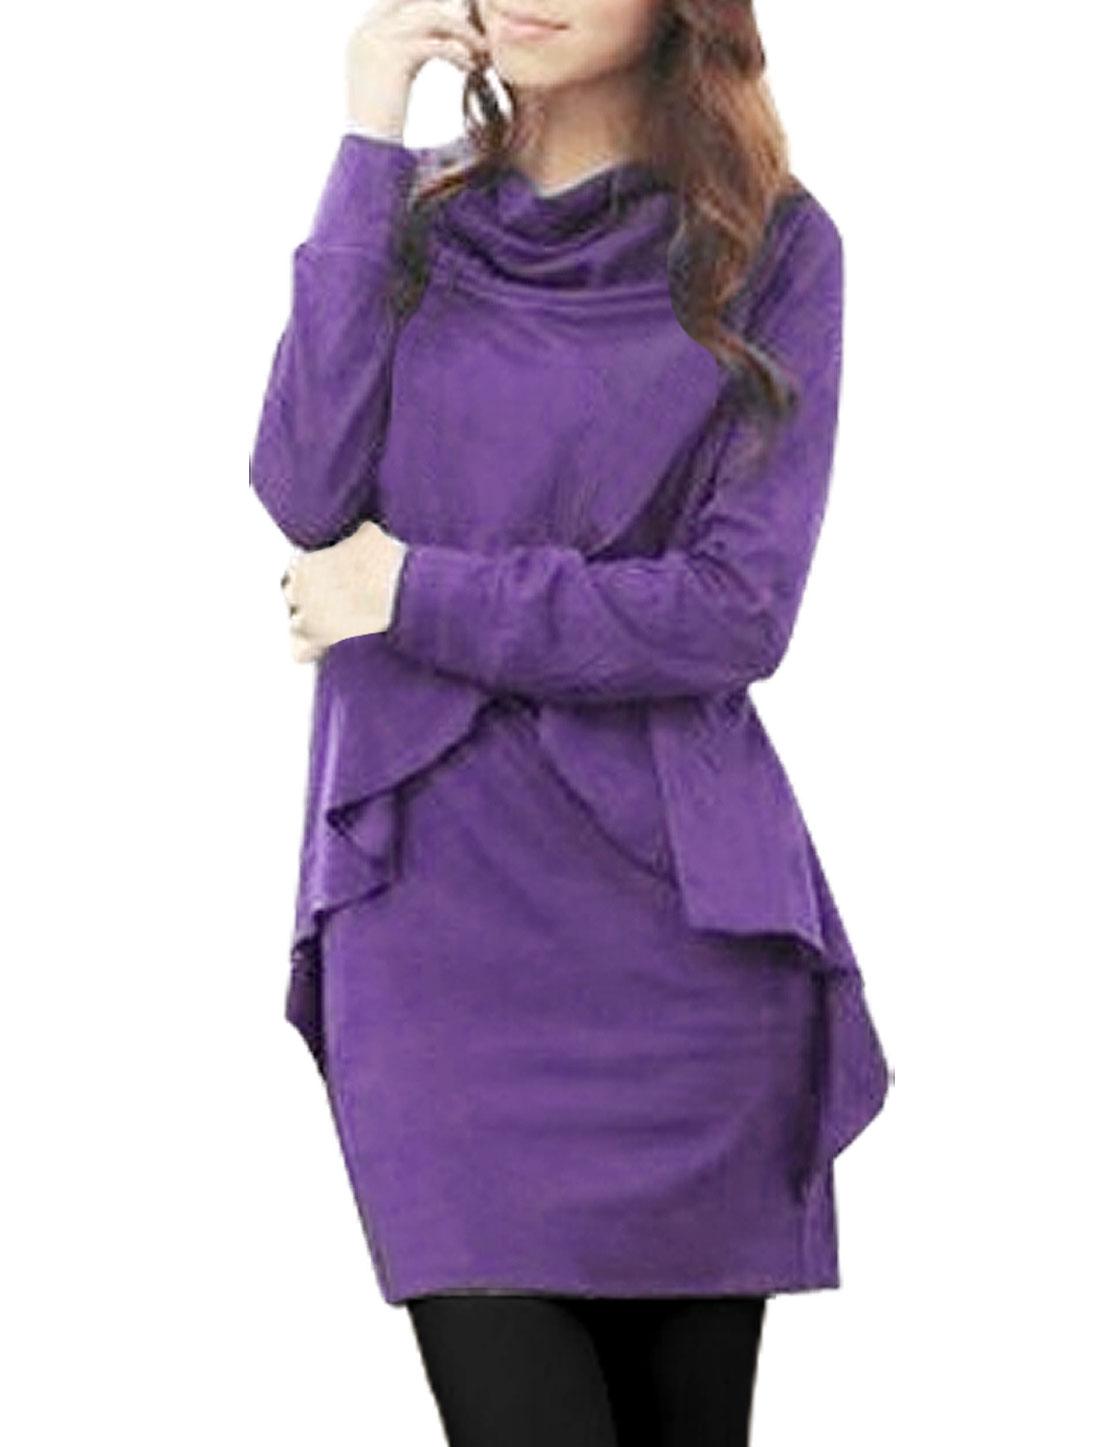 Lady Purple Long Sleeve Front Cross Overlap Tunic Shirt XS